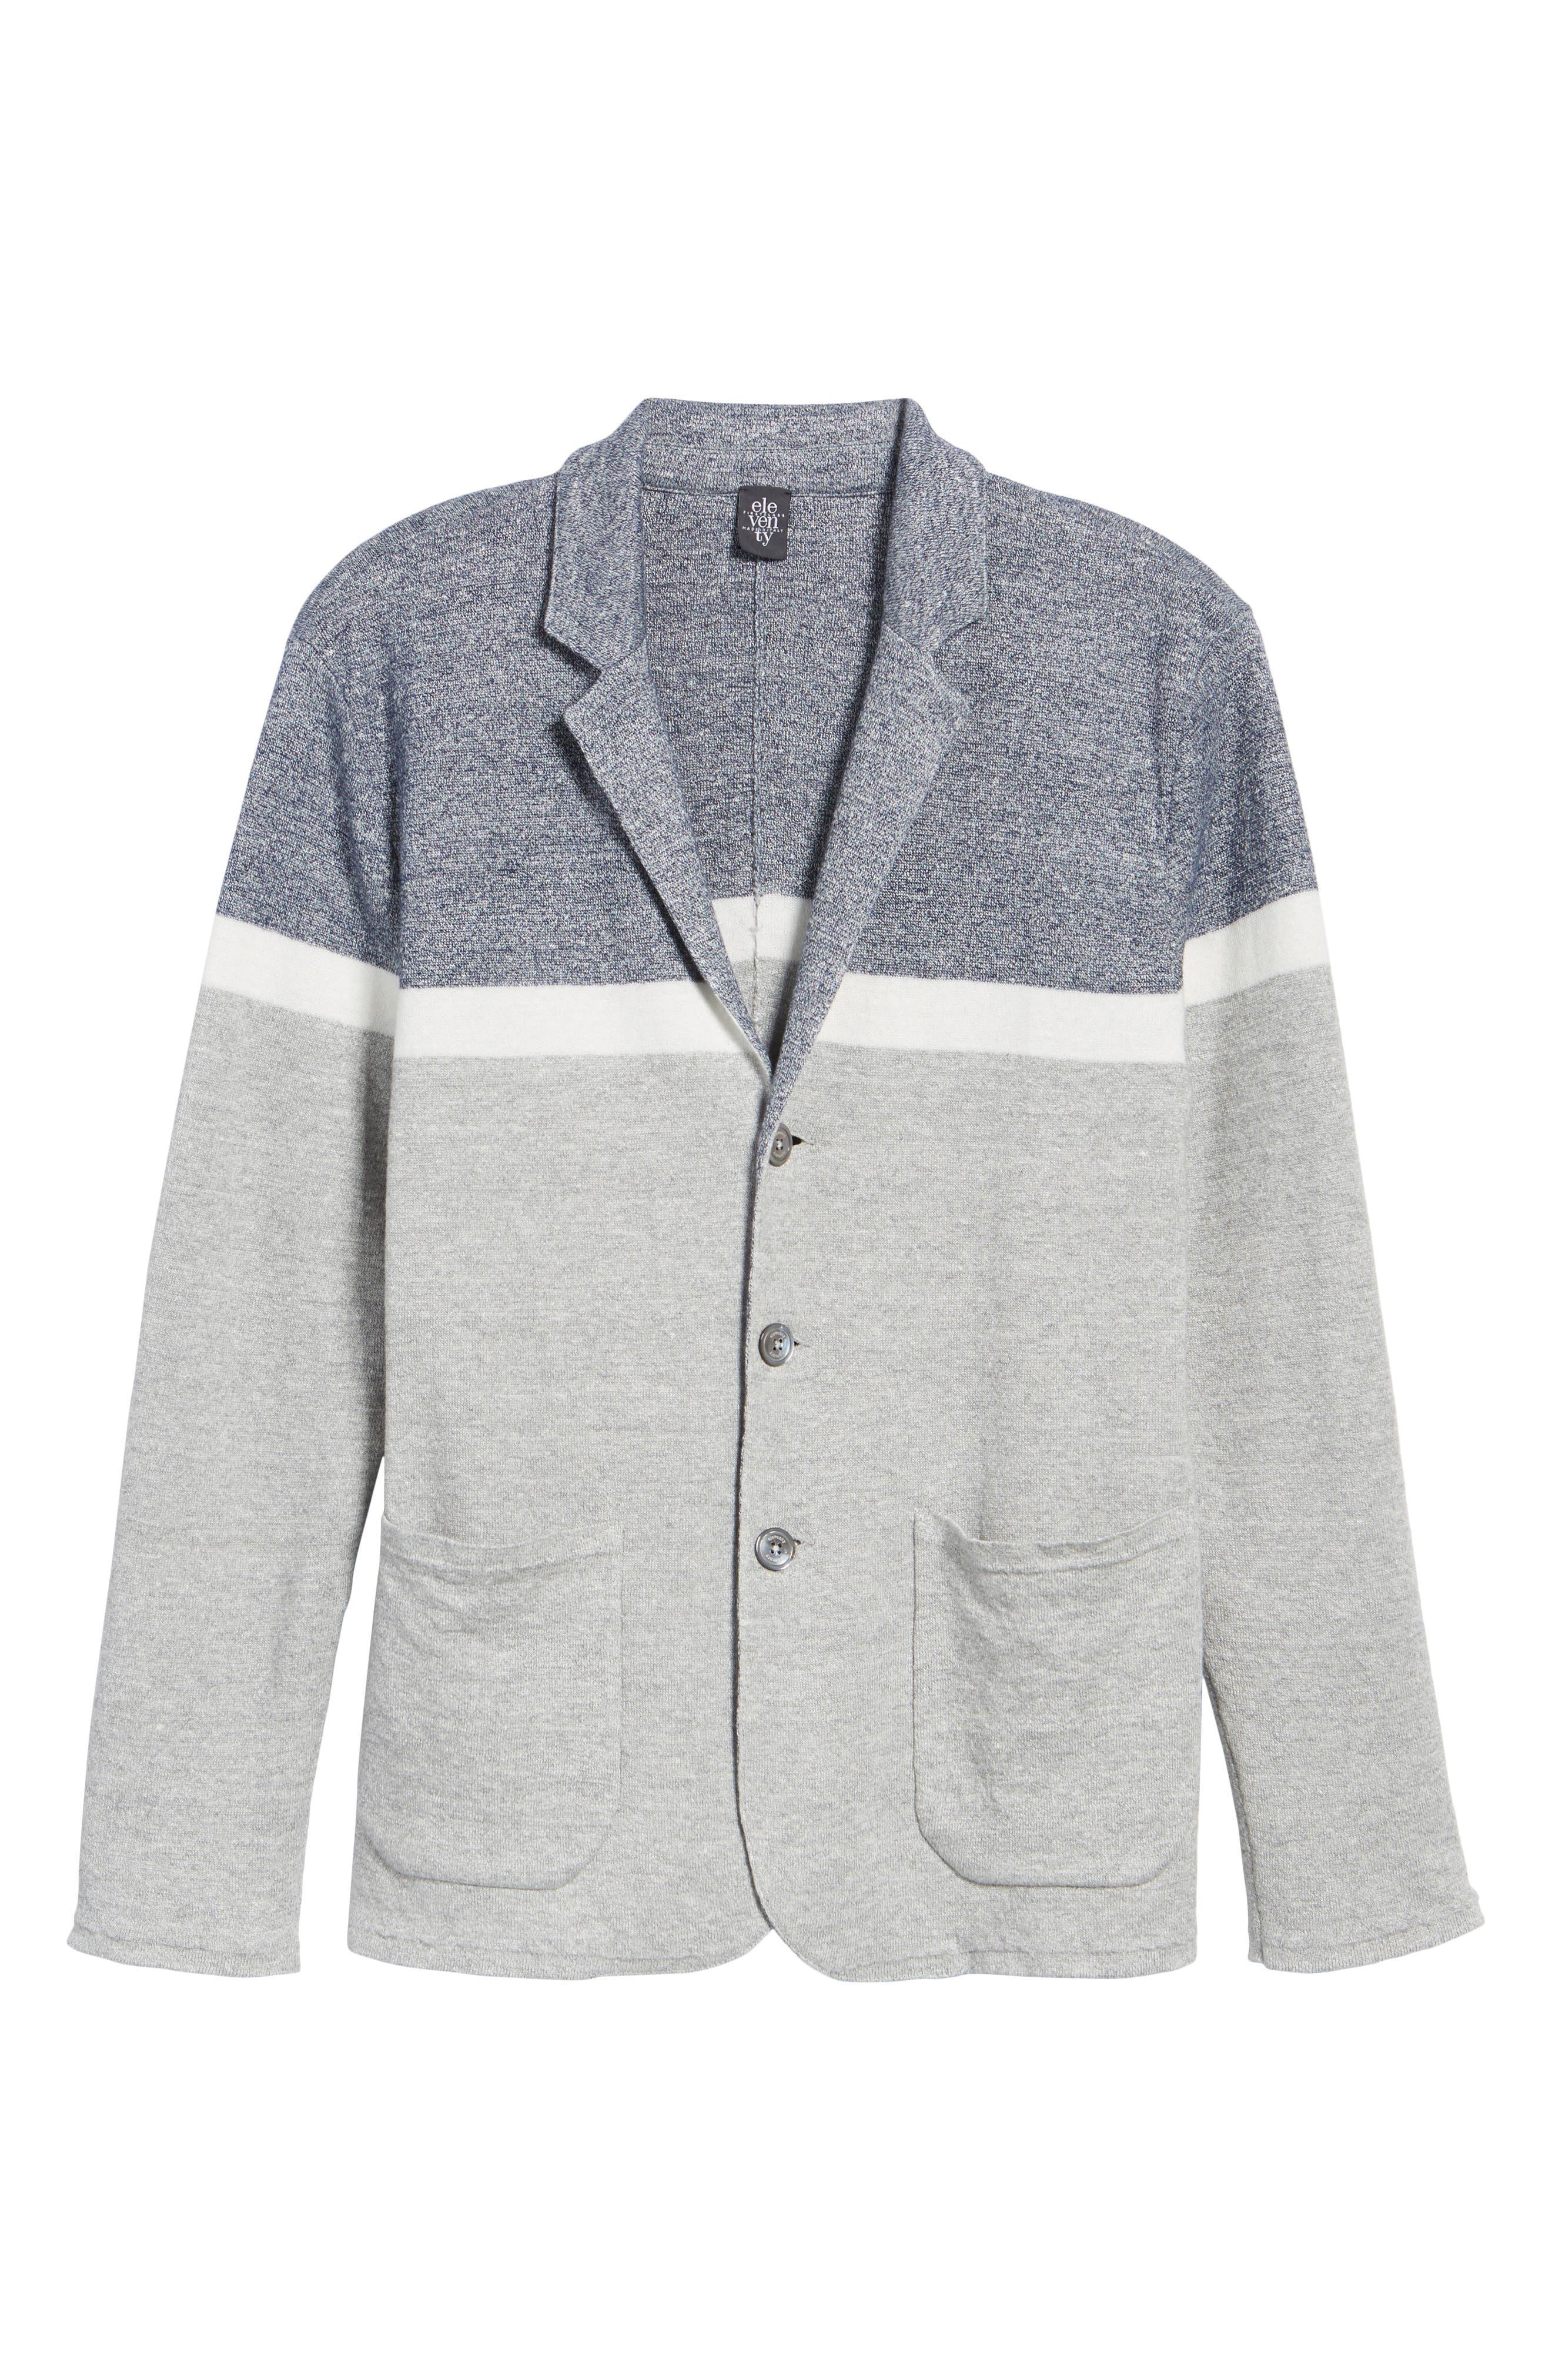 Colorblock Sweater Jacket,                             Alternate thumbnail 6, color,                             Grey